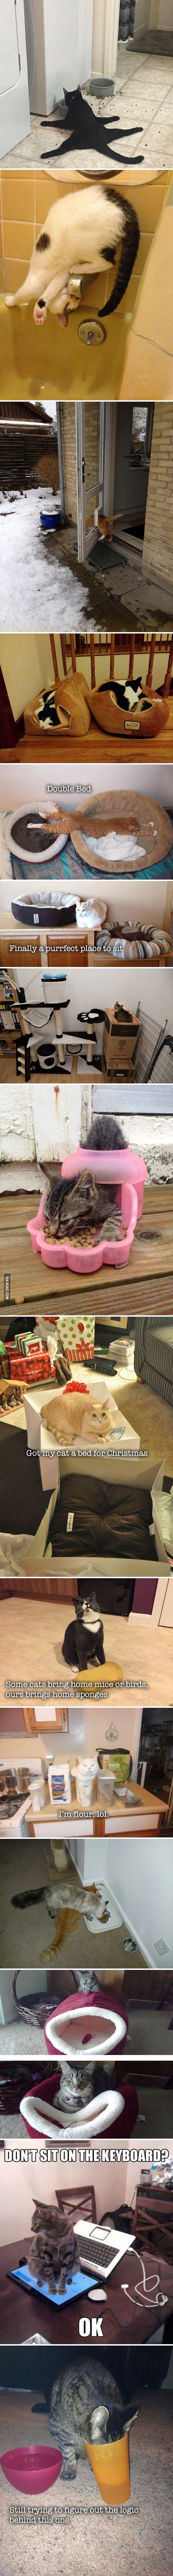 15 Hilarious Examples Of Cat Logics: